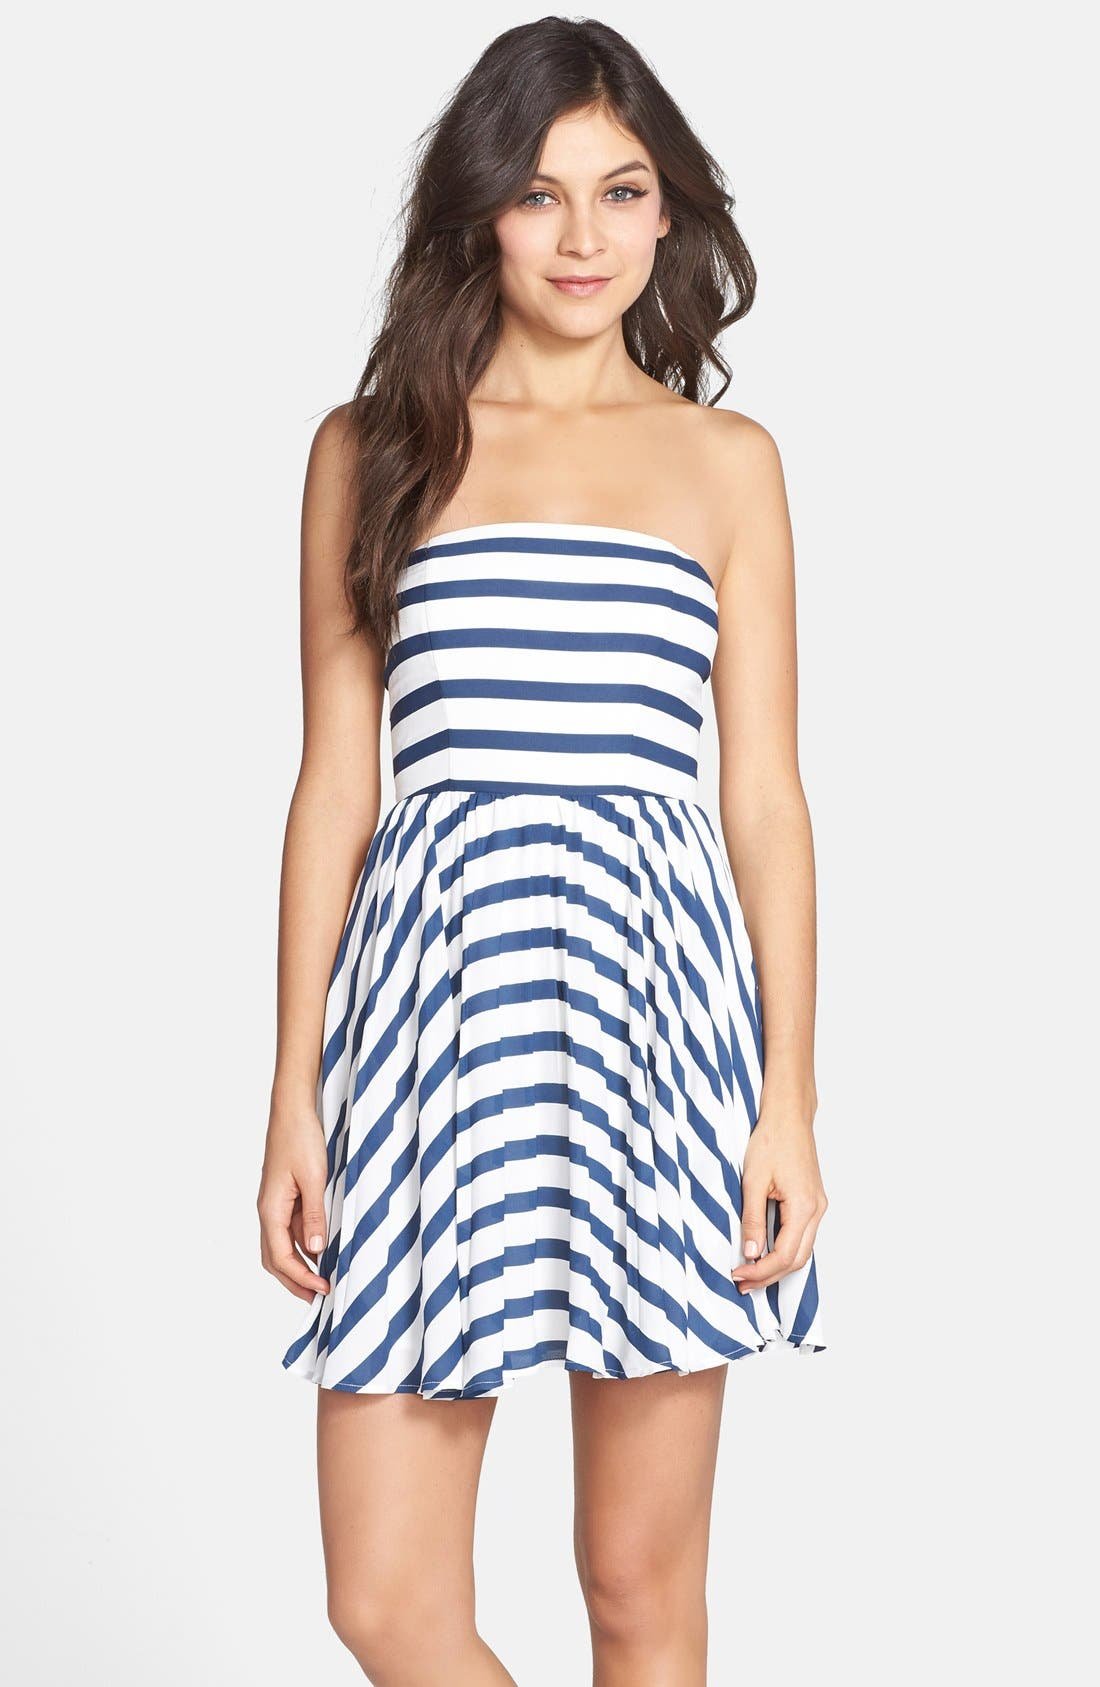 Alternate Image 1 Selected - BB Dakota 'Aleta' Stripe Strapless Fit & Flare Dress